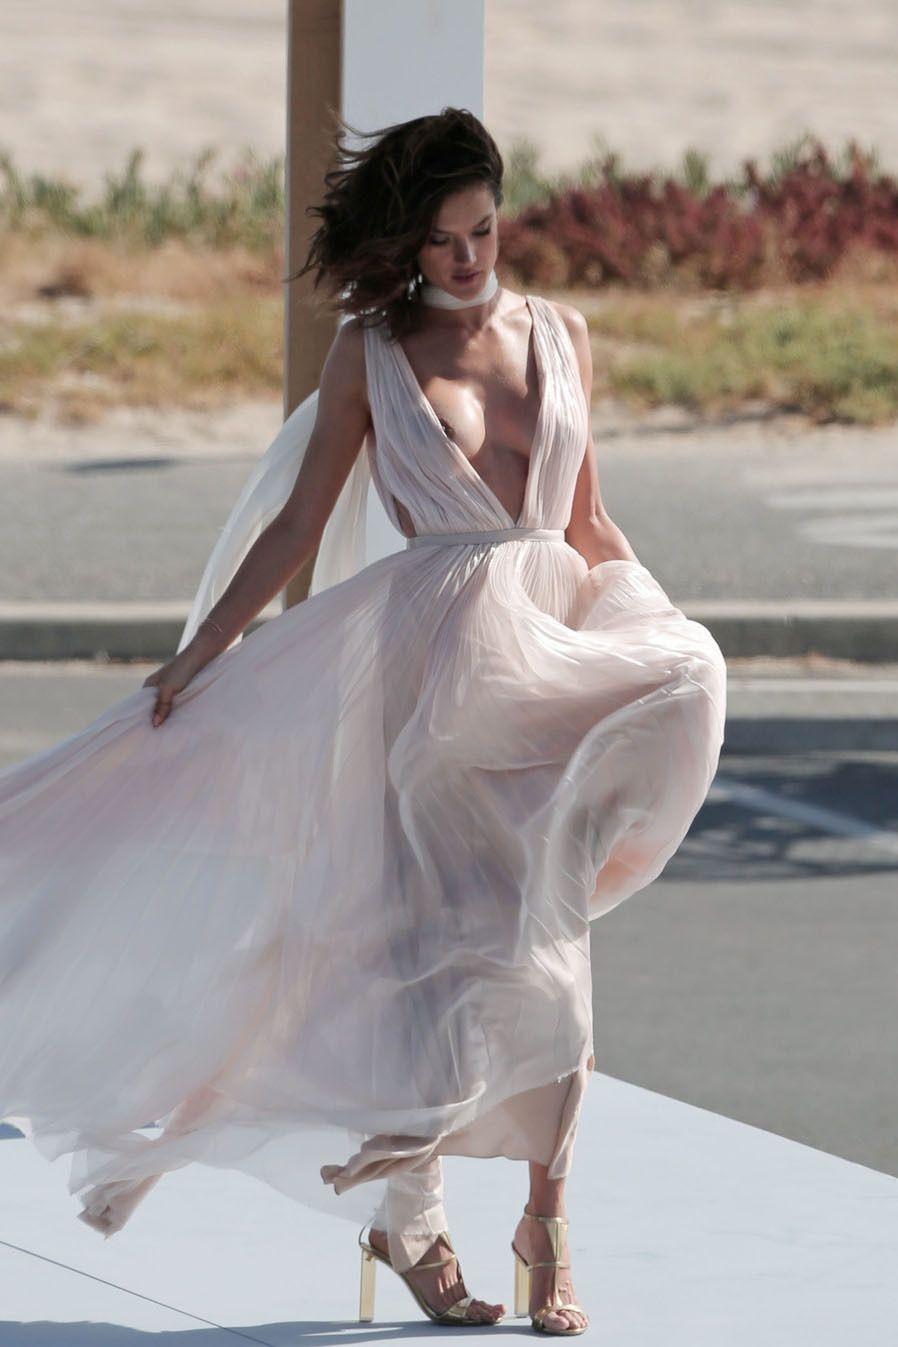 Alessandra Ambrosio Nipple Slip On A Photo Shoot